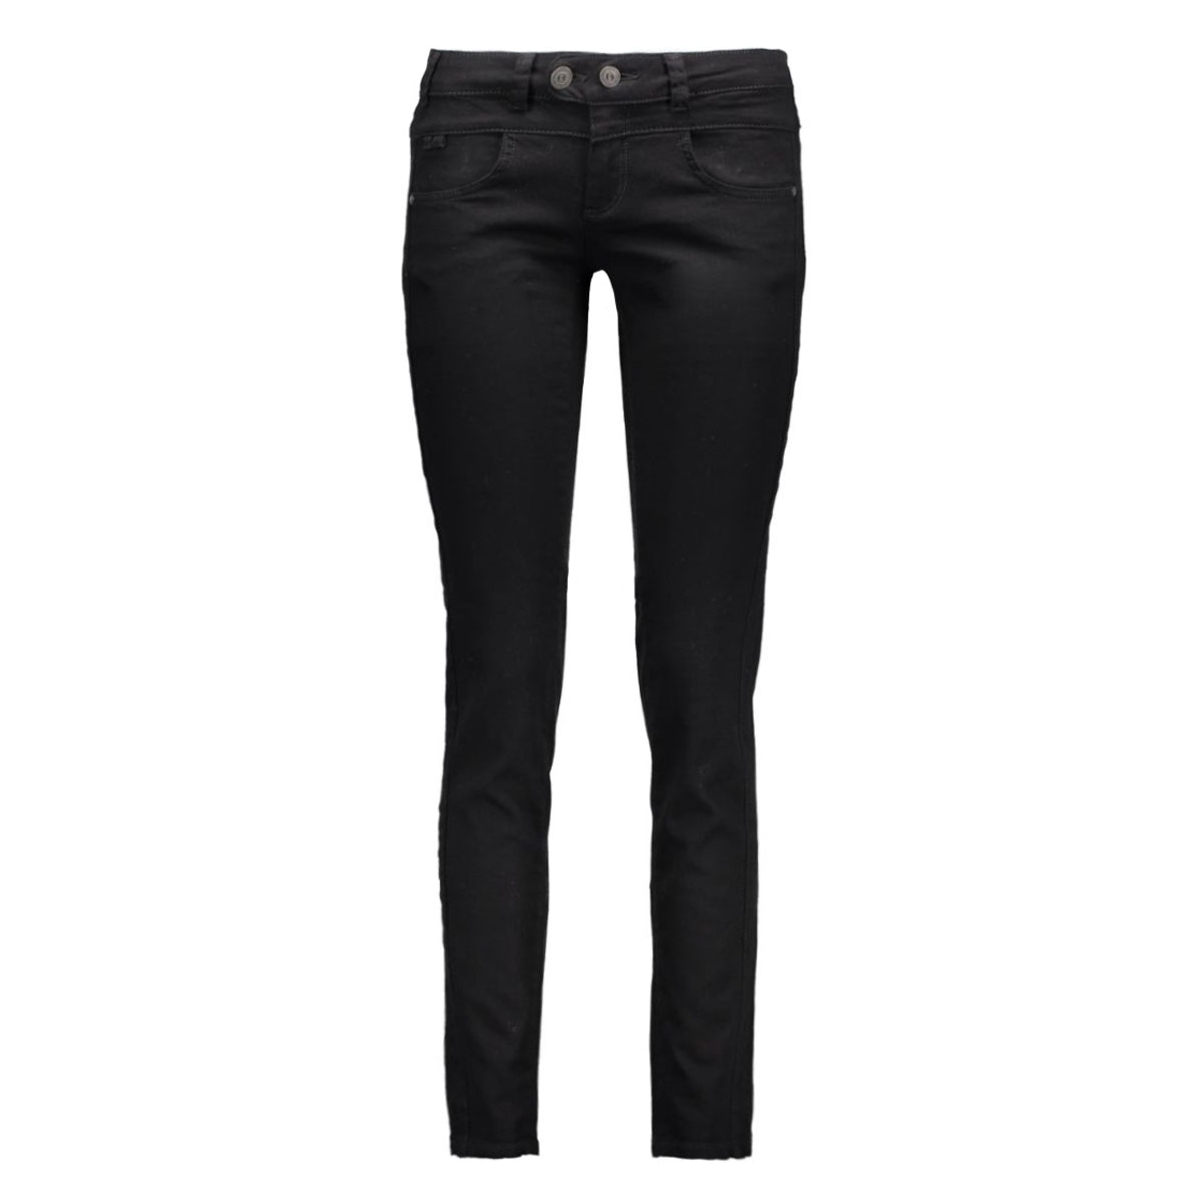 objup-c black obb164 23020781 object jeans black